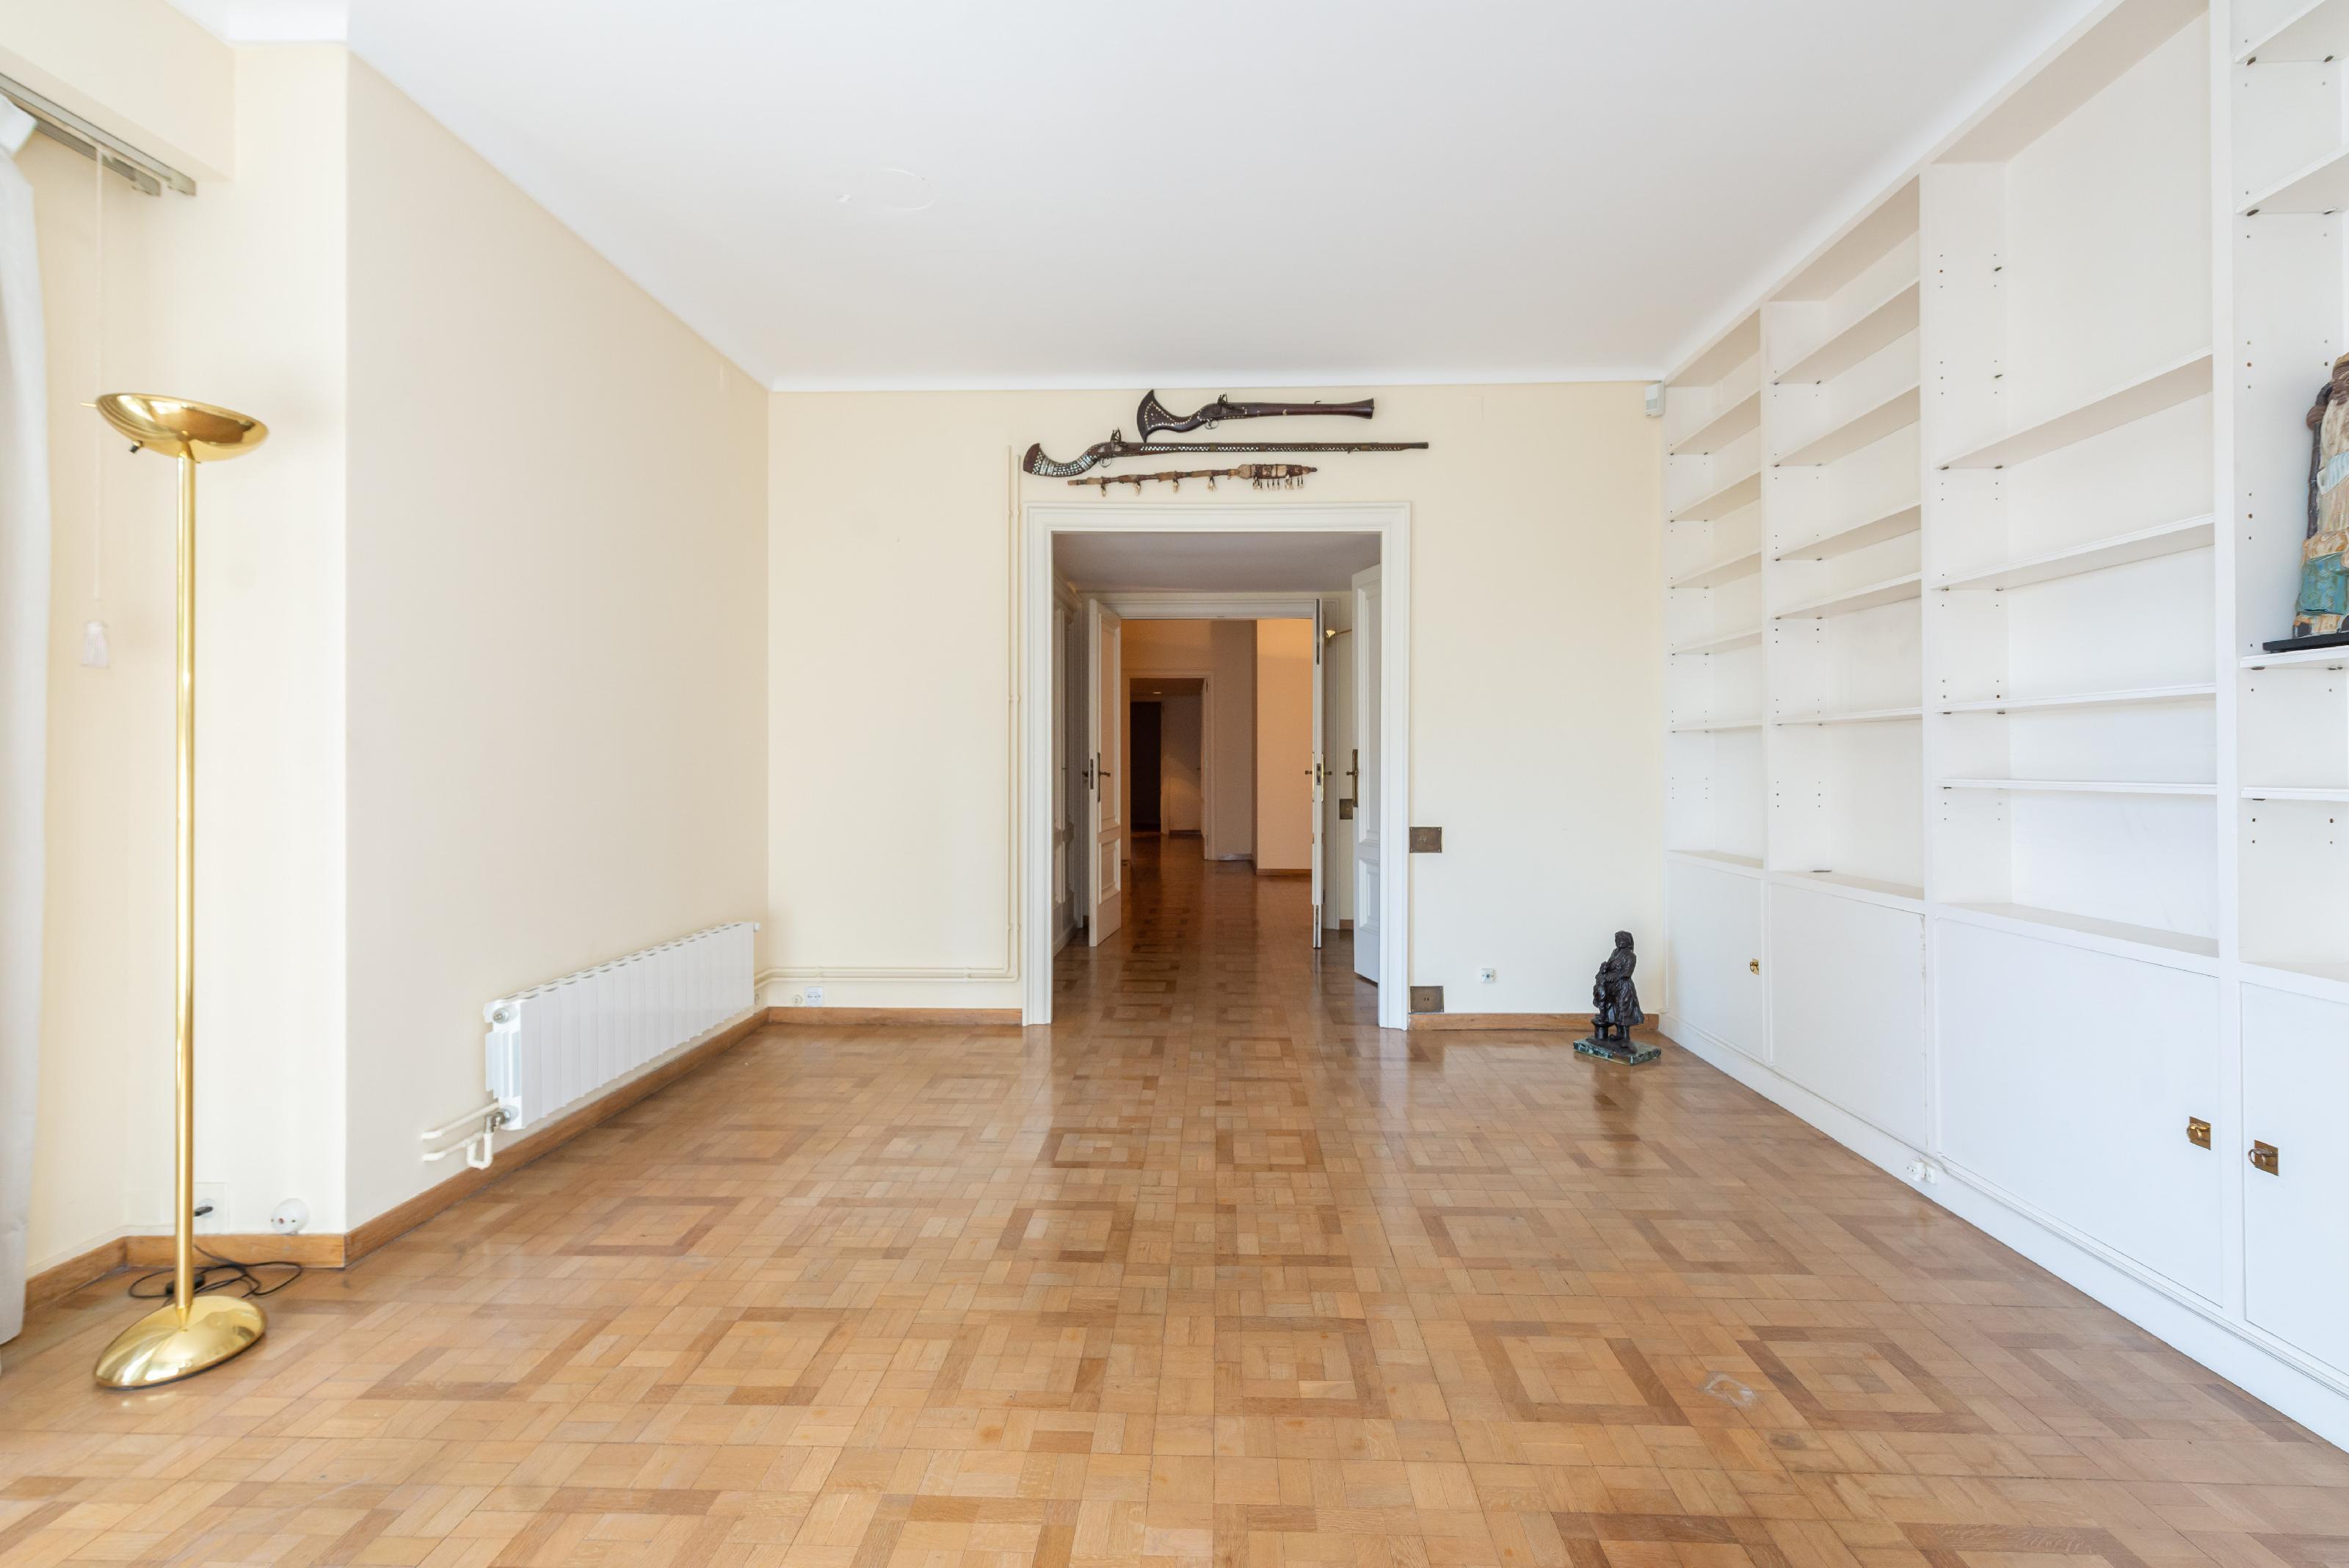 253581 Piso en venda en Sarrià-Sant Gervasi, Sant Gervasi-Galvany 32